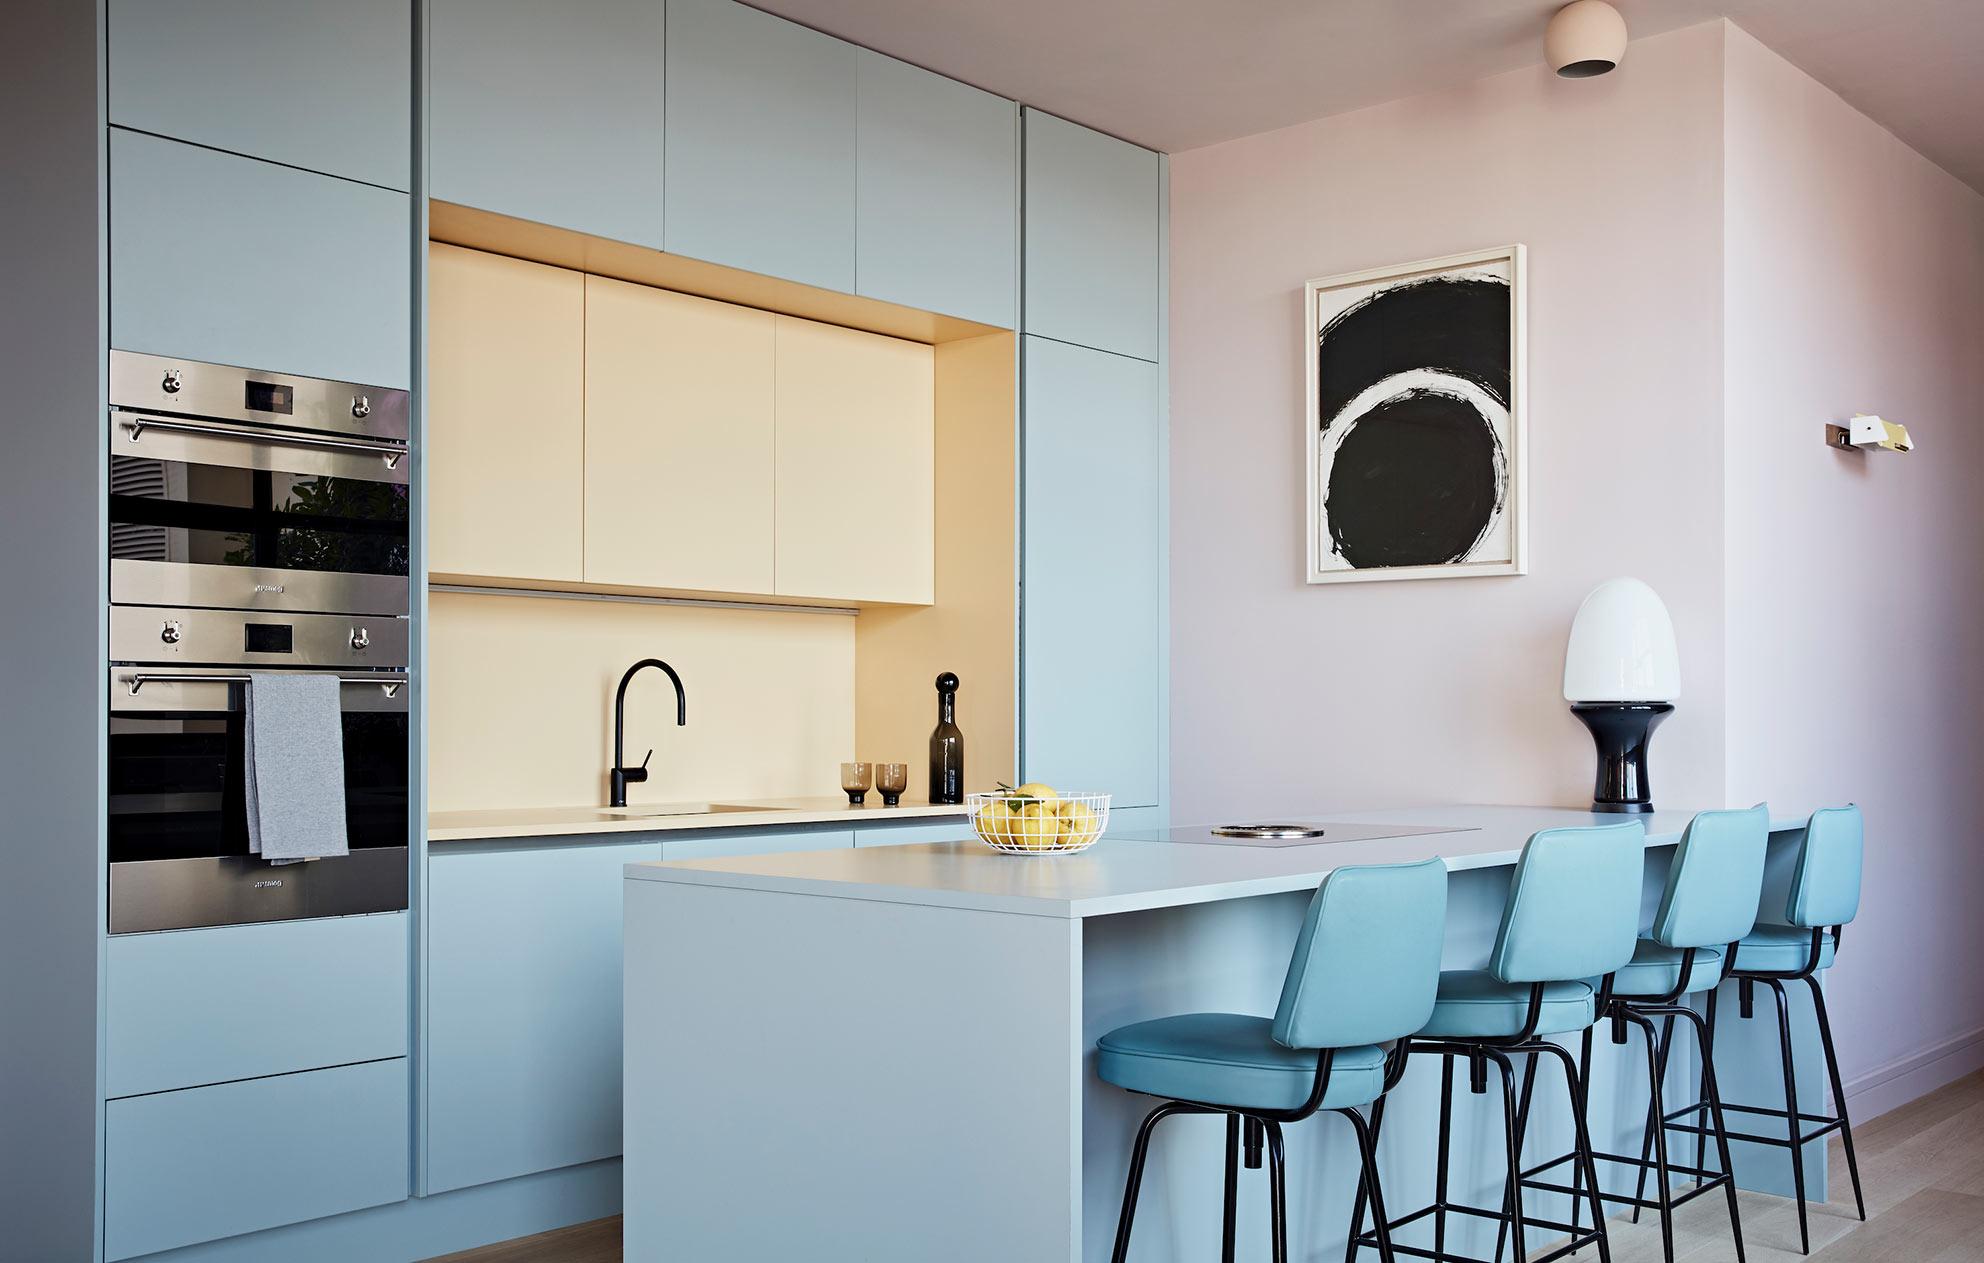 West London pied-a-terre pastel kitchen